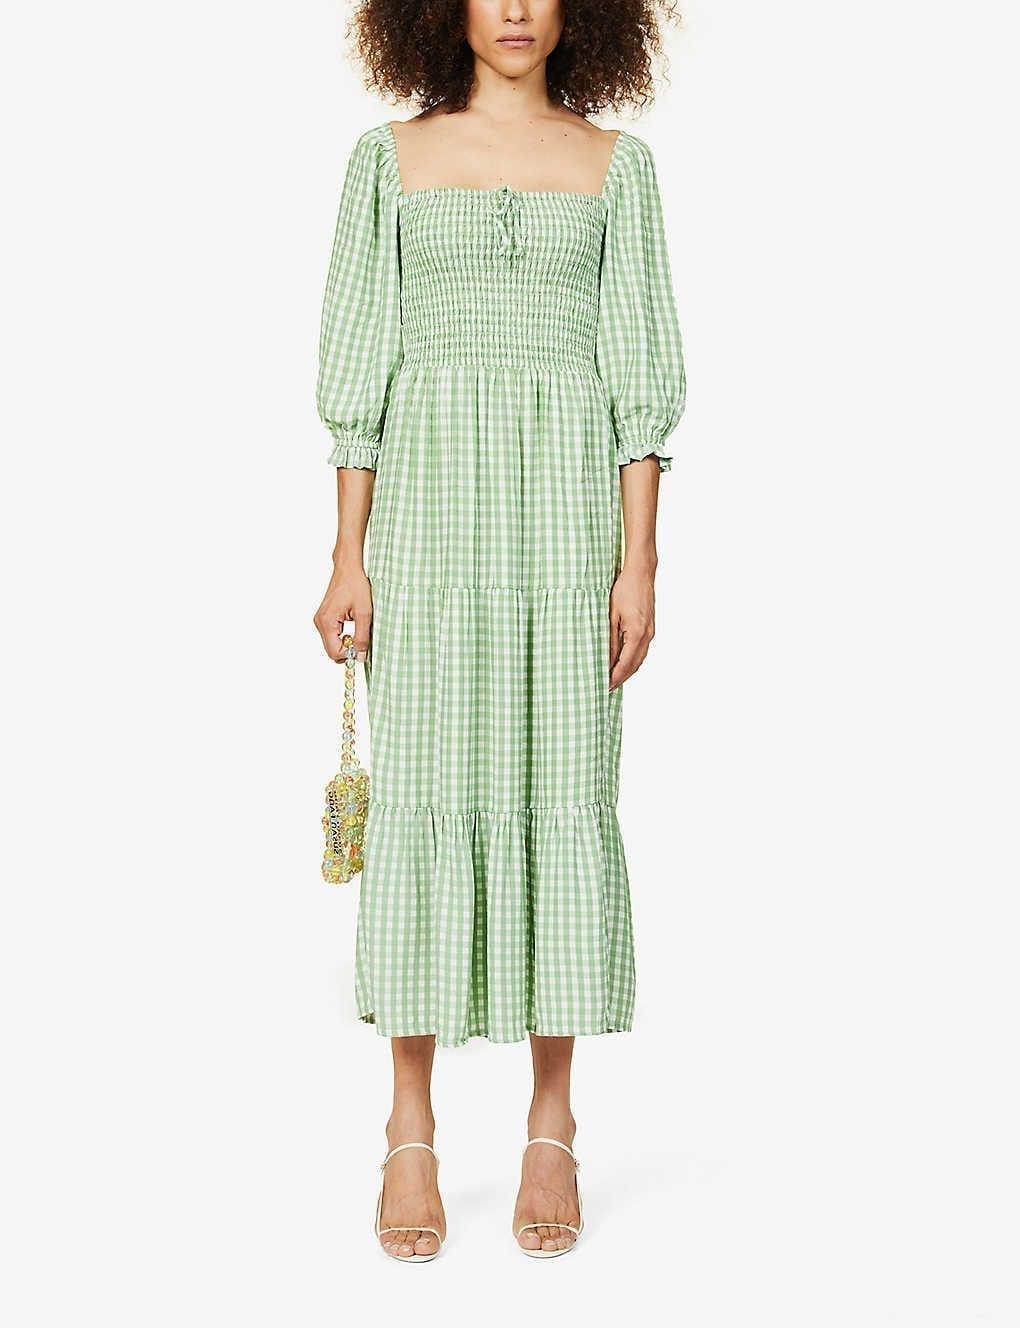 FAITHFULL THE BRAND Galet Gingham-print Puff-sleeve Woven Midi Dress